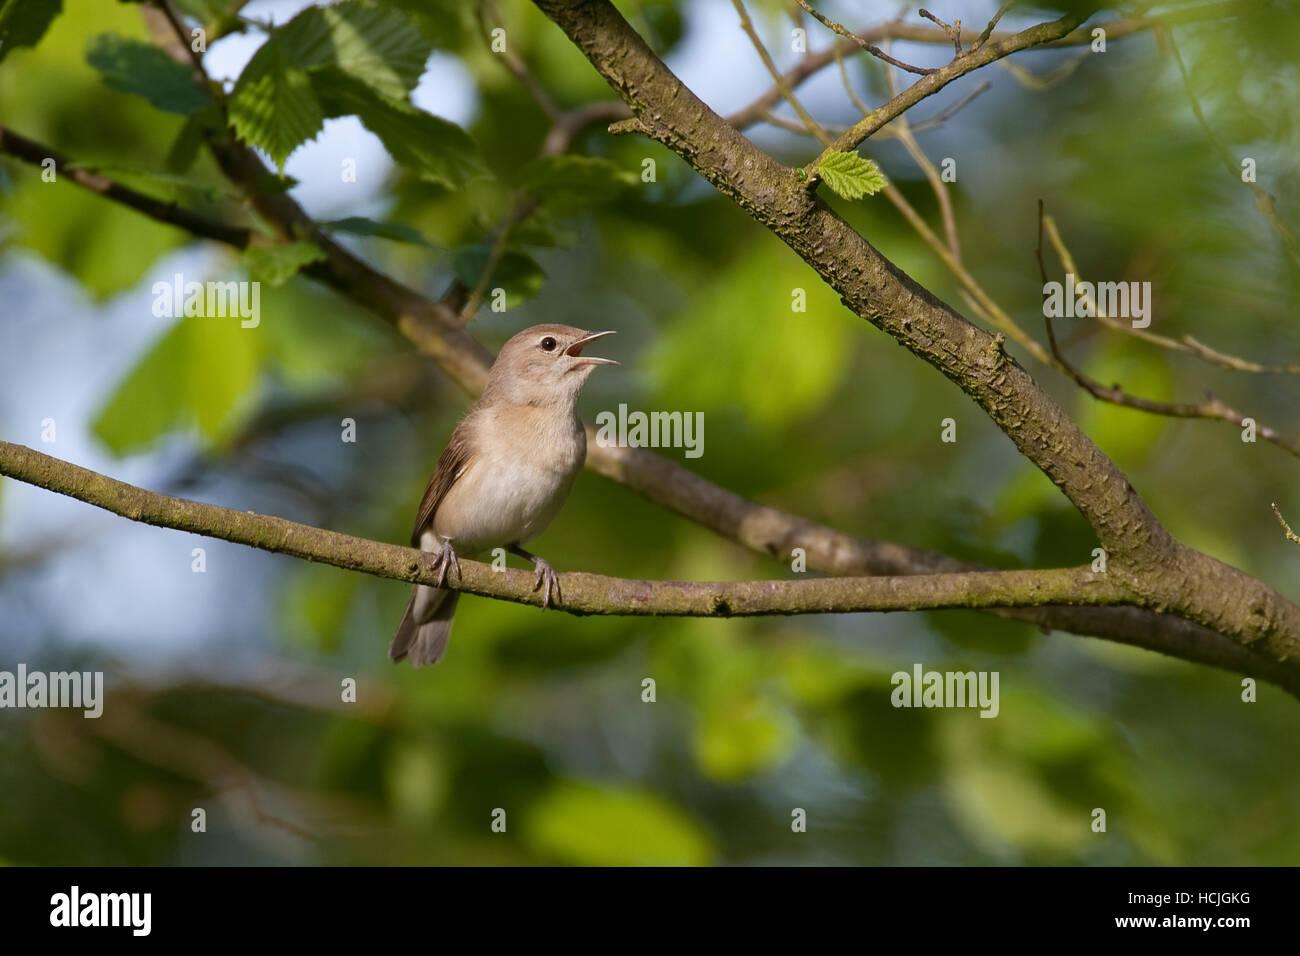 Gartengrasmücke, Garten-Grasmücke, Grasmücke, Sylvia borin, garden warbler - Stock Image